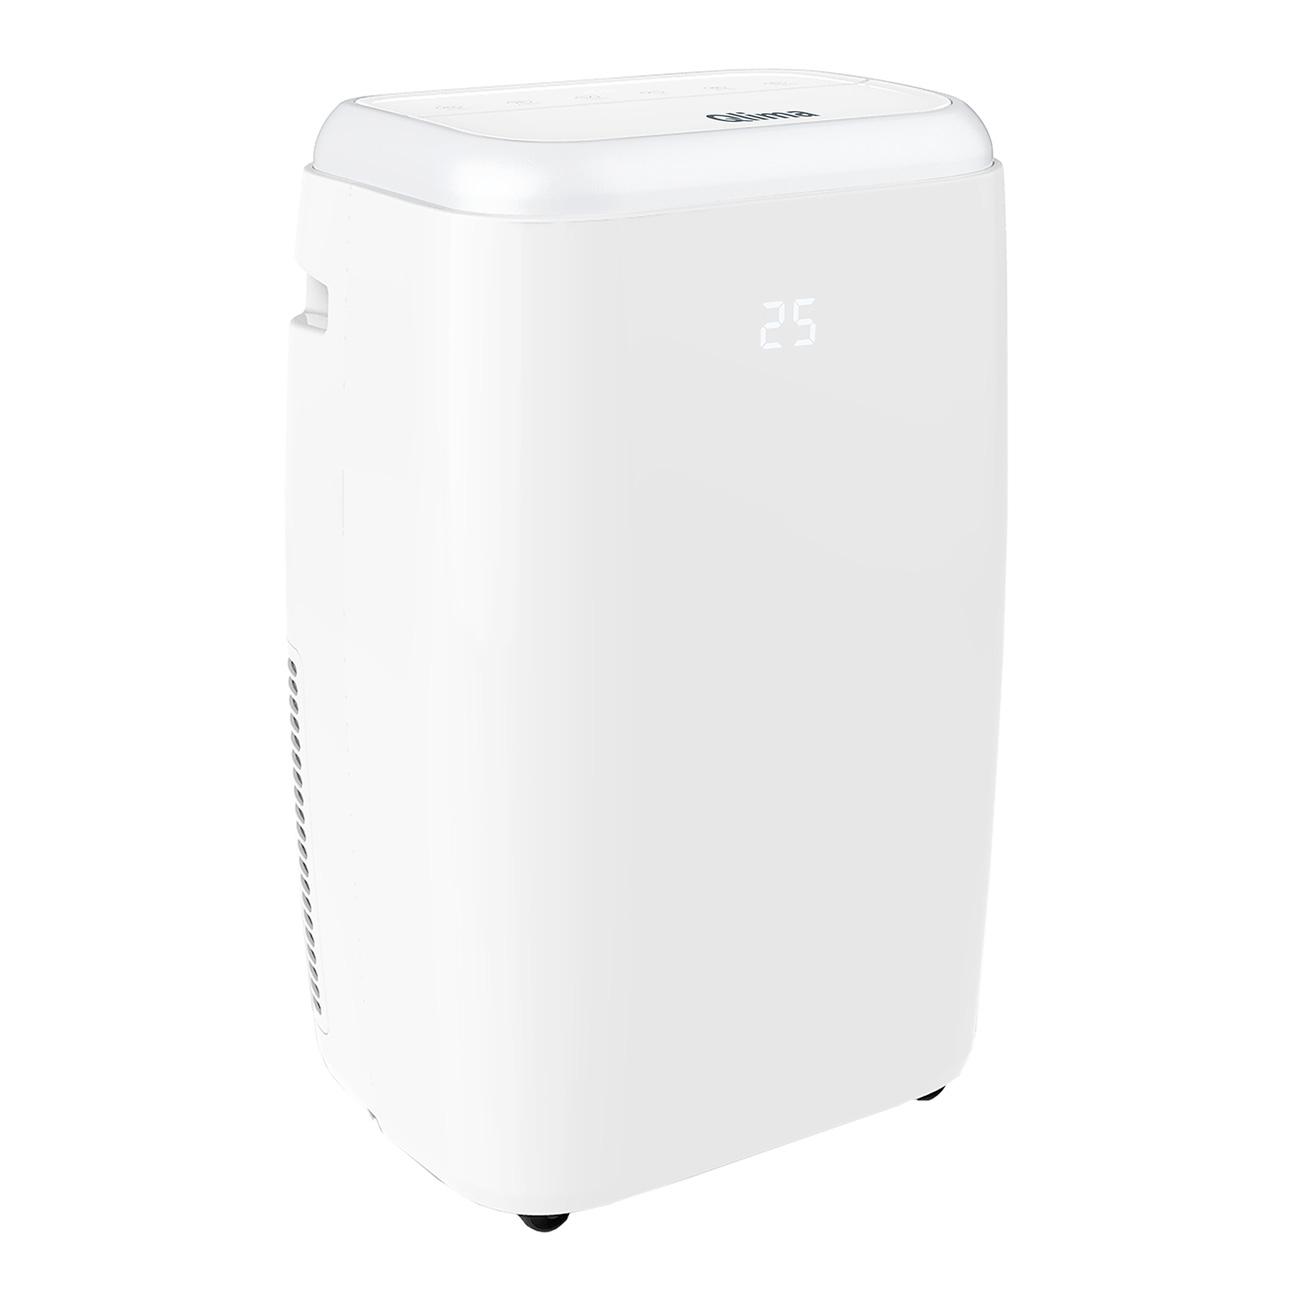 Aire acondicionado portátil Qlima P234